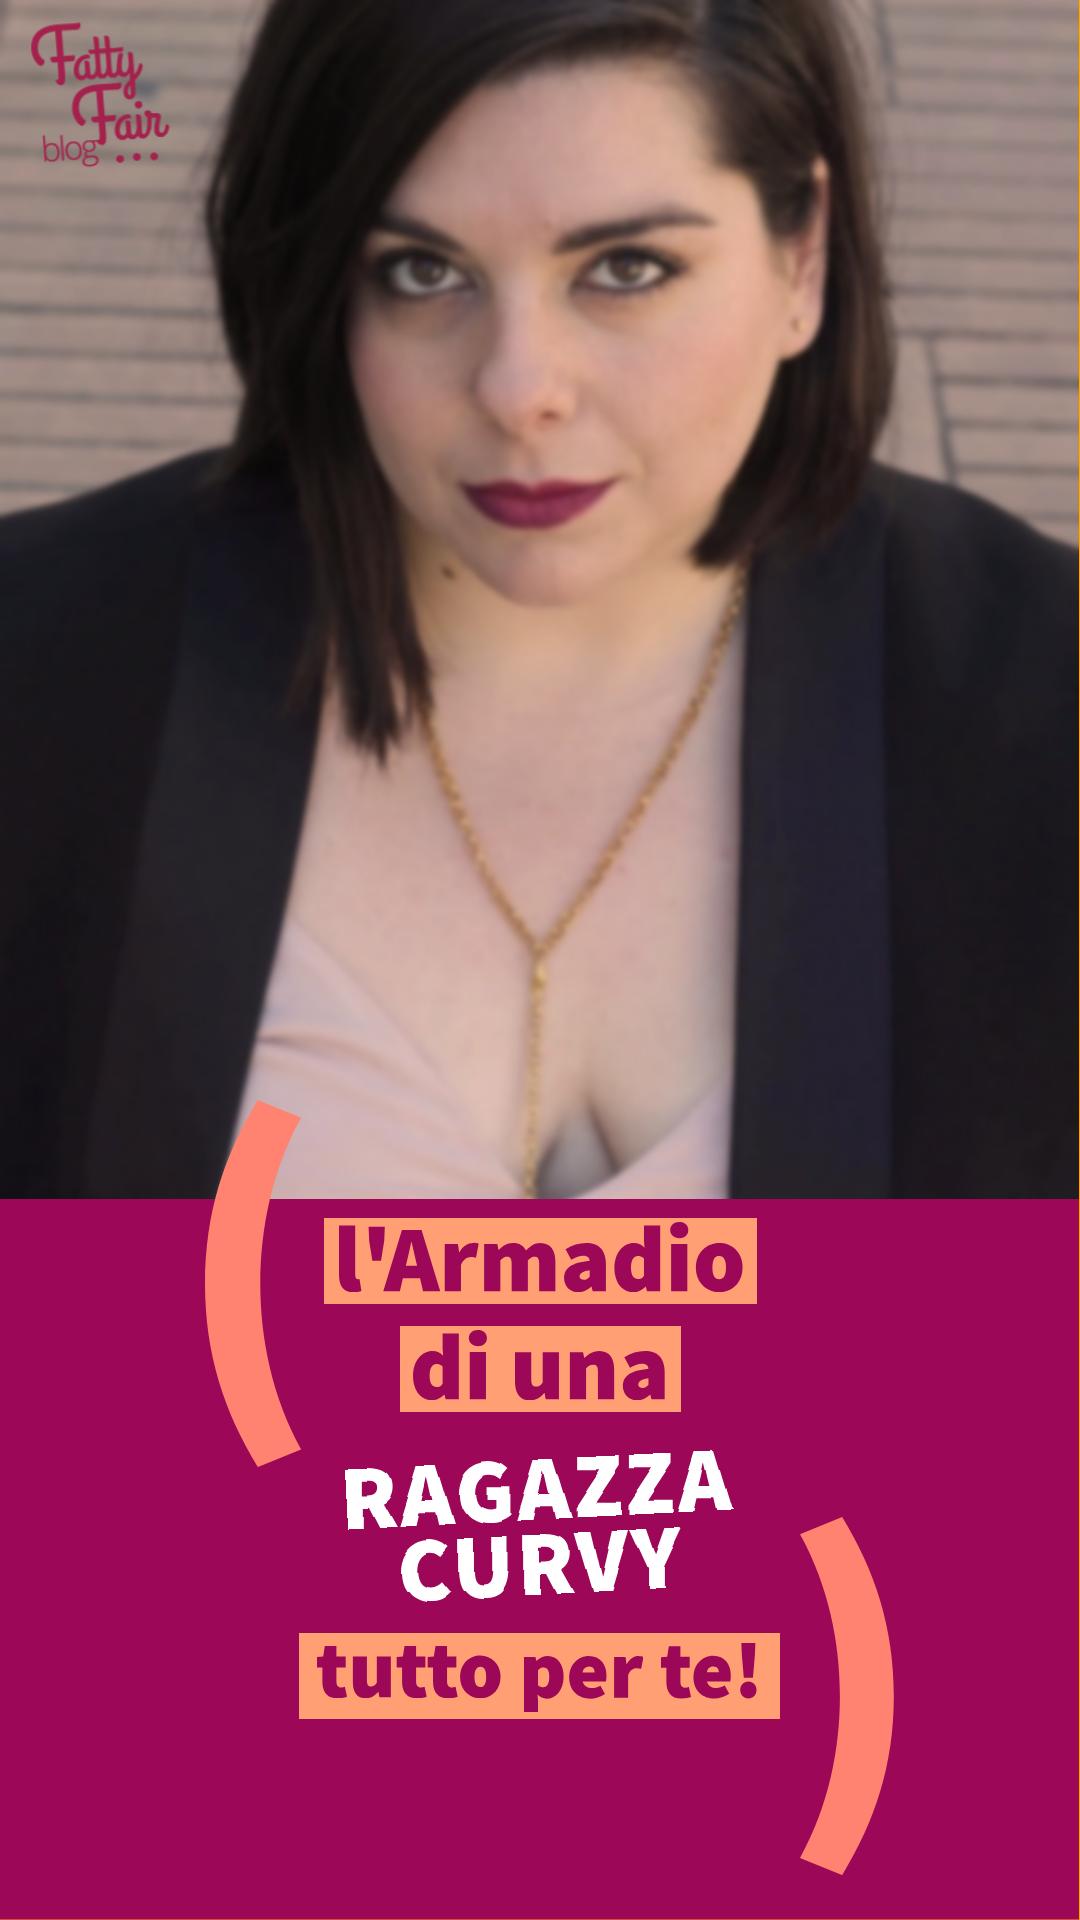 Ragazza Curvy dating app